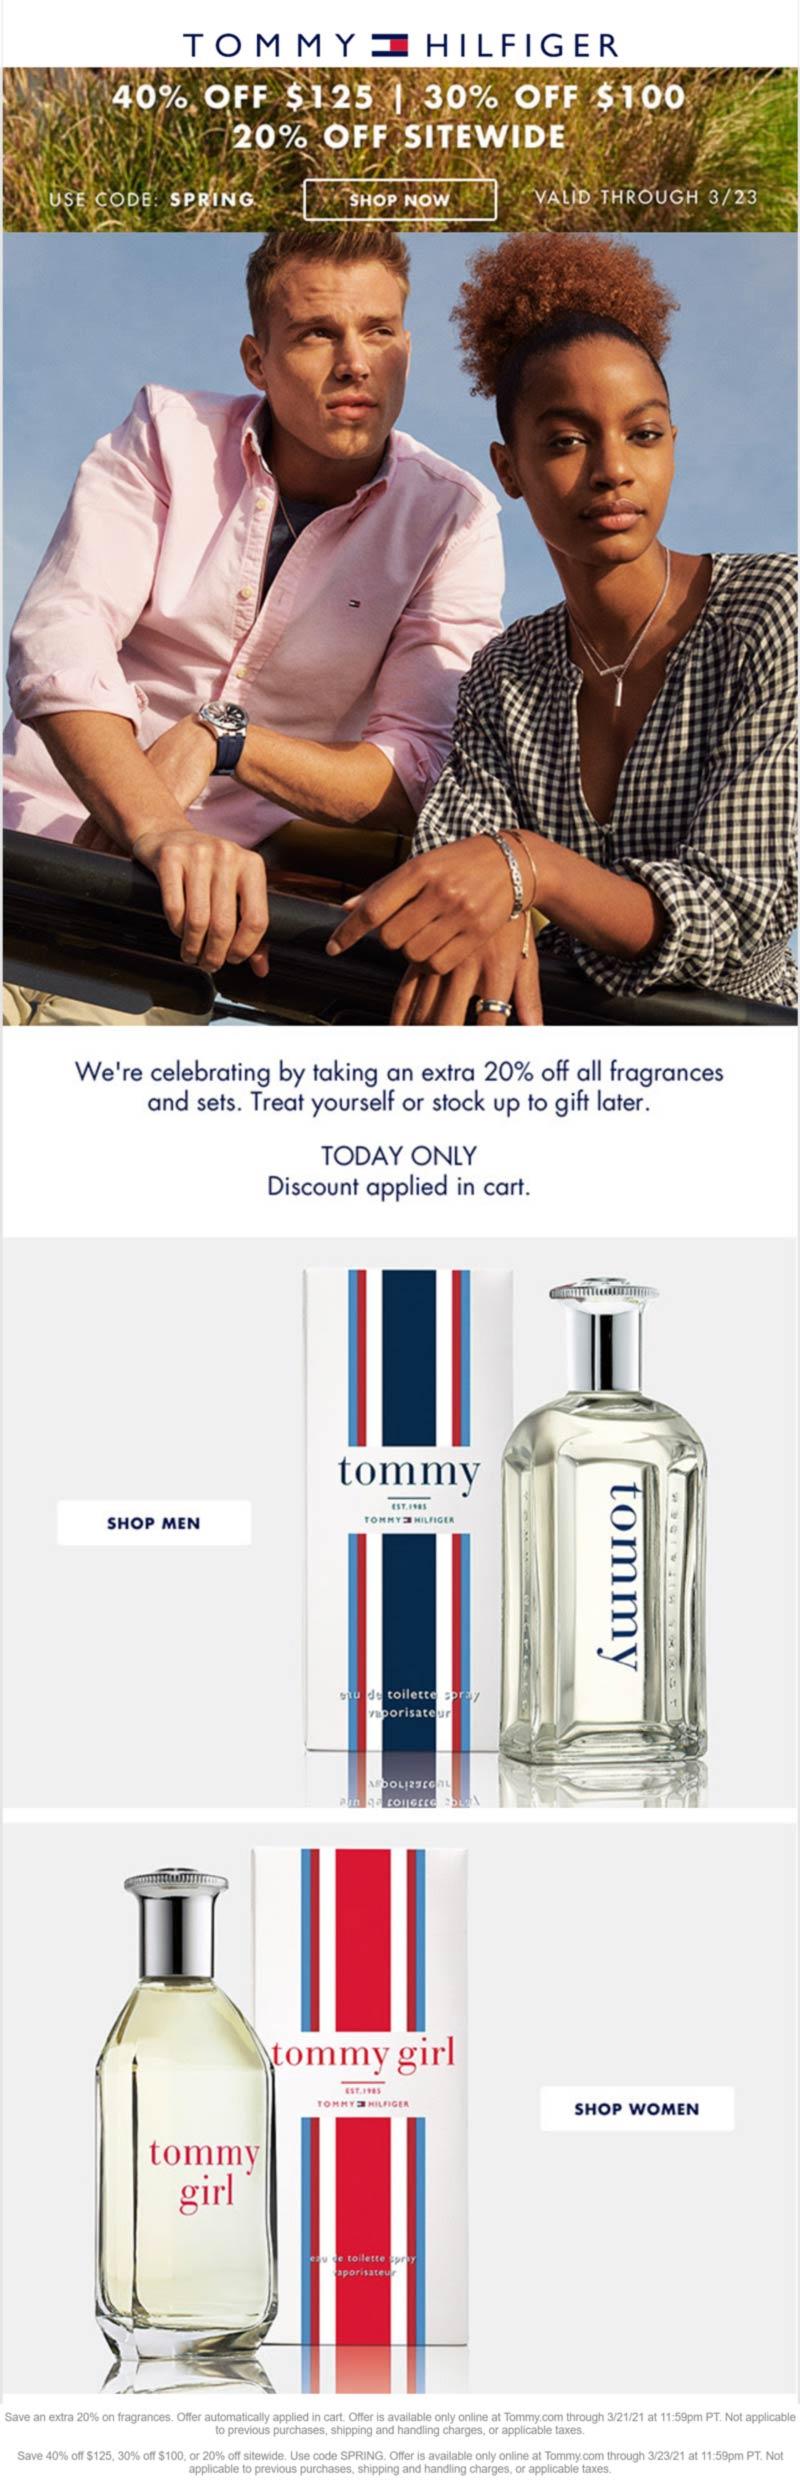 Tommy Hilfiger stores Coupon  20-40% off at Tommy Hilfiger via promo code SPRING #tommyhilfiger